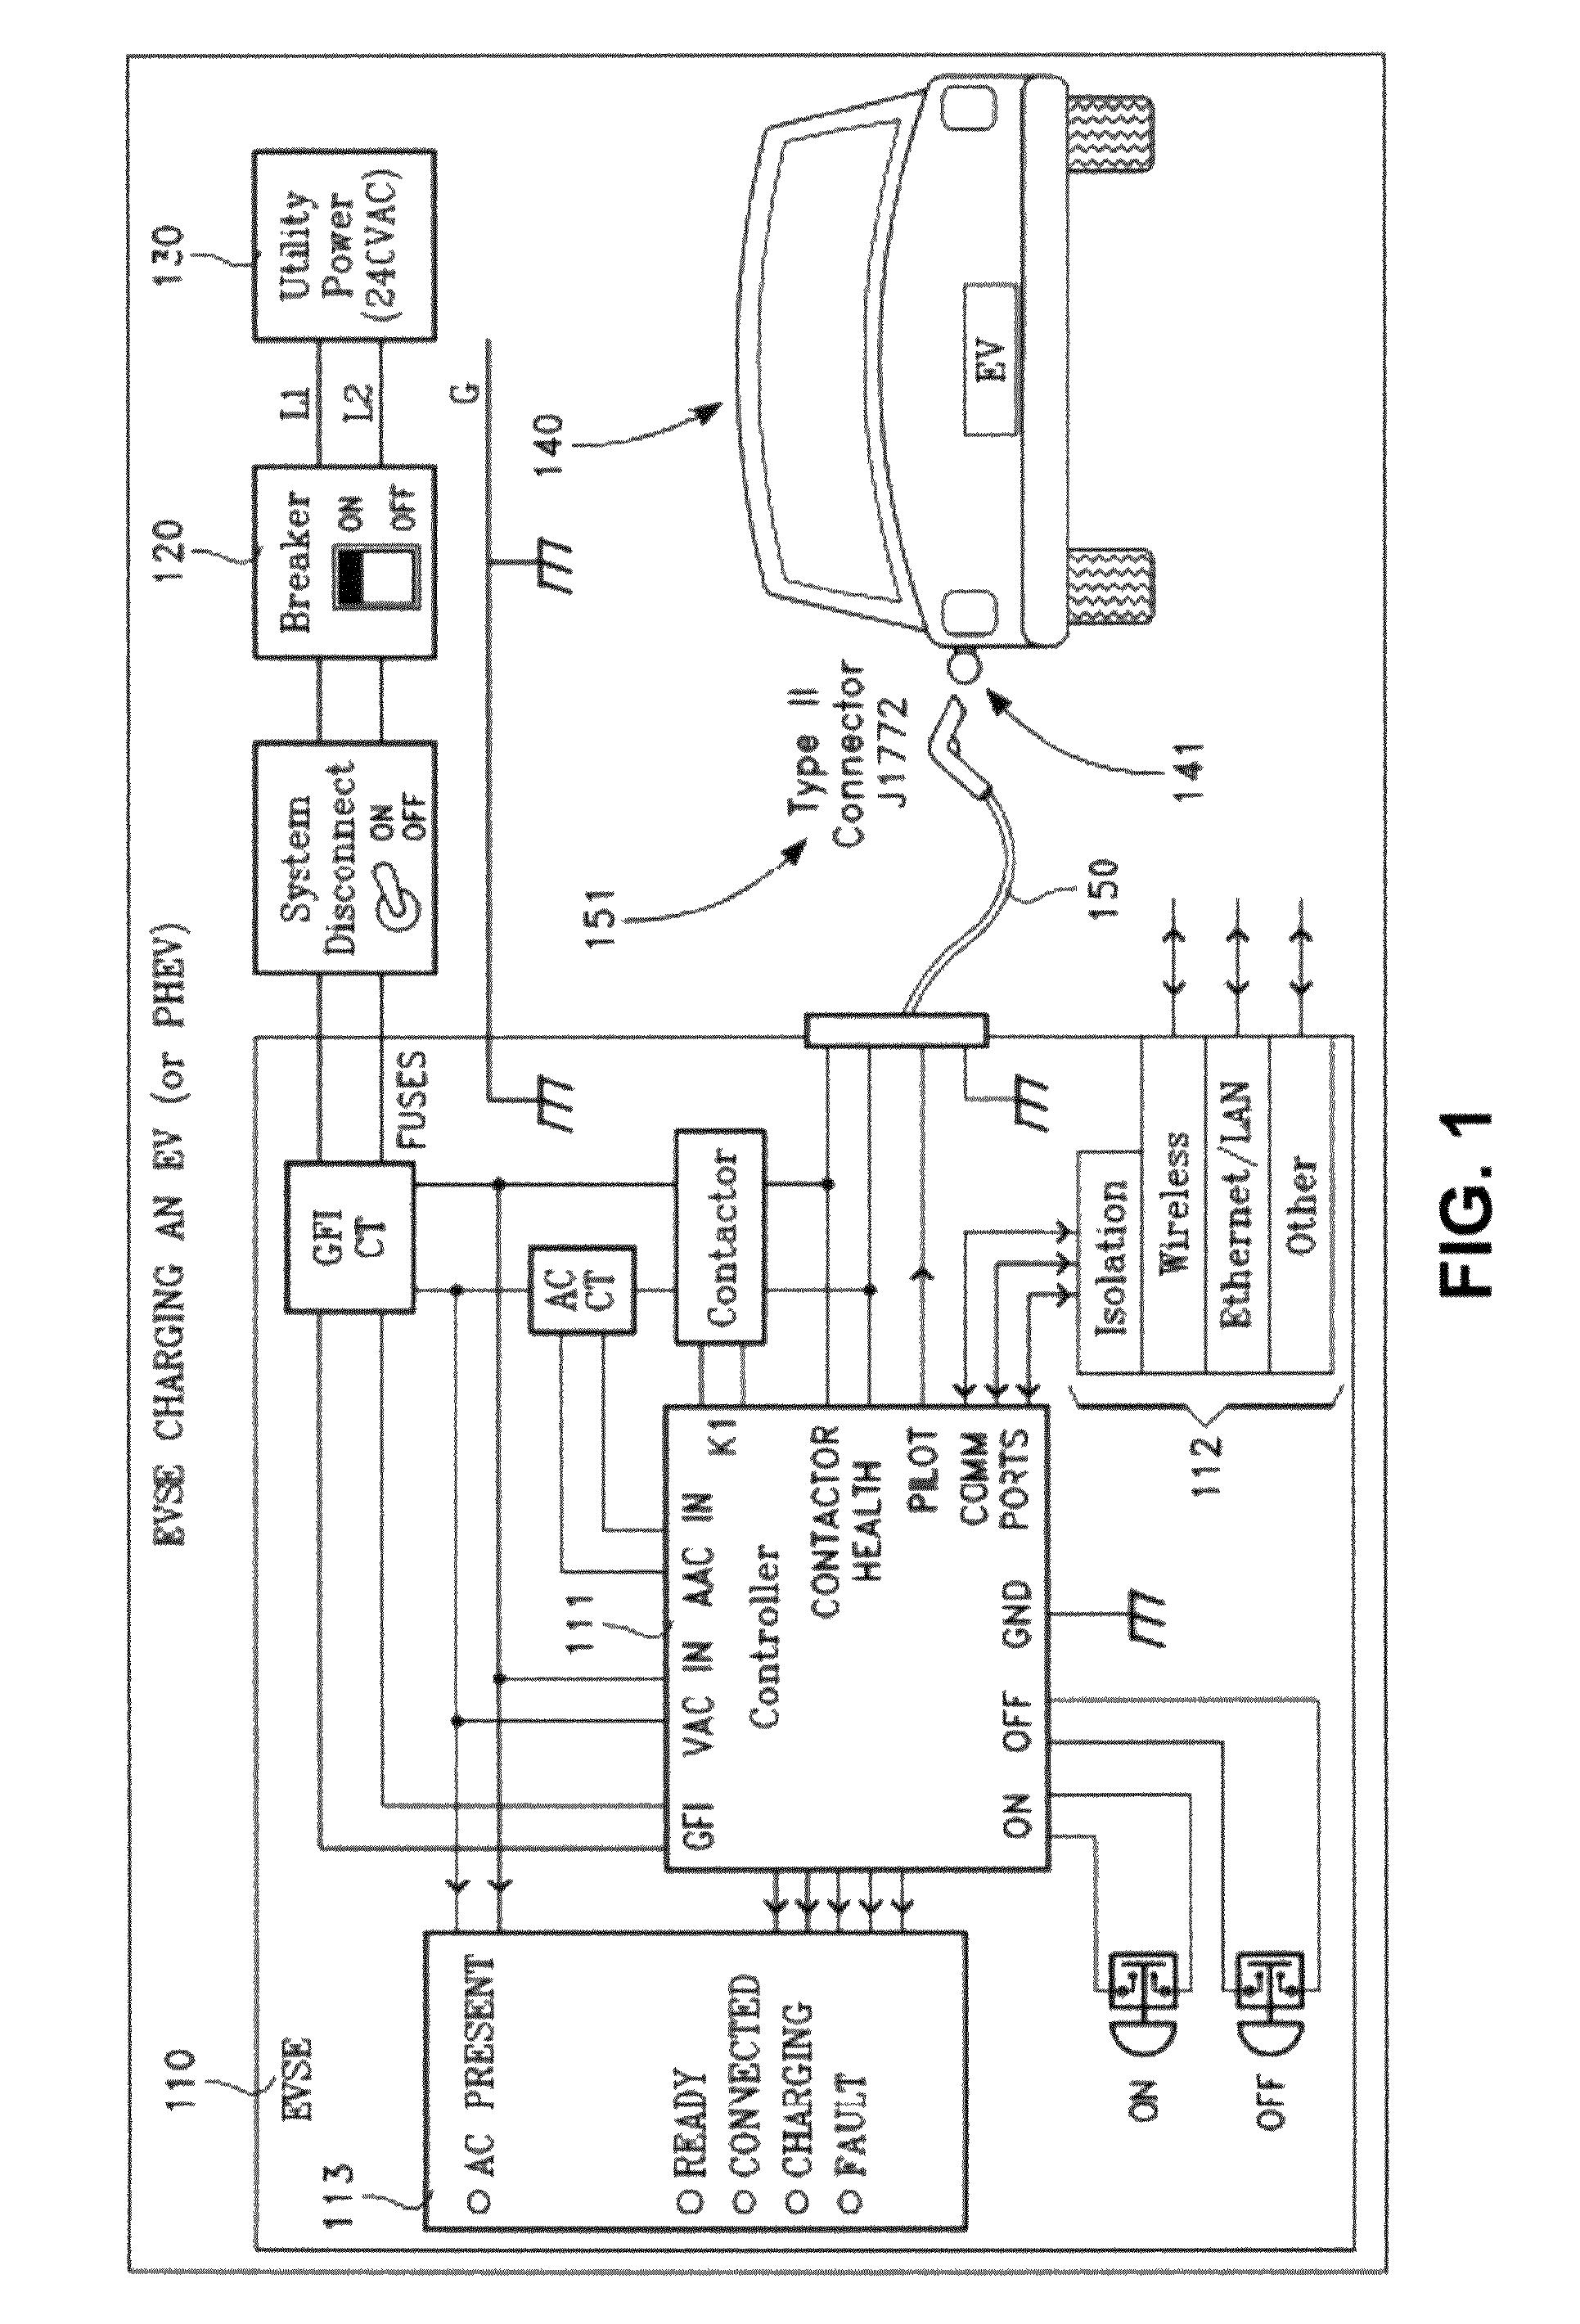 zx1200 wiring diagram snatch block diagrams wiring diagram